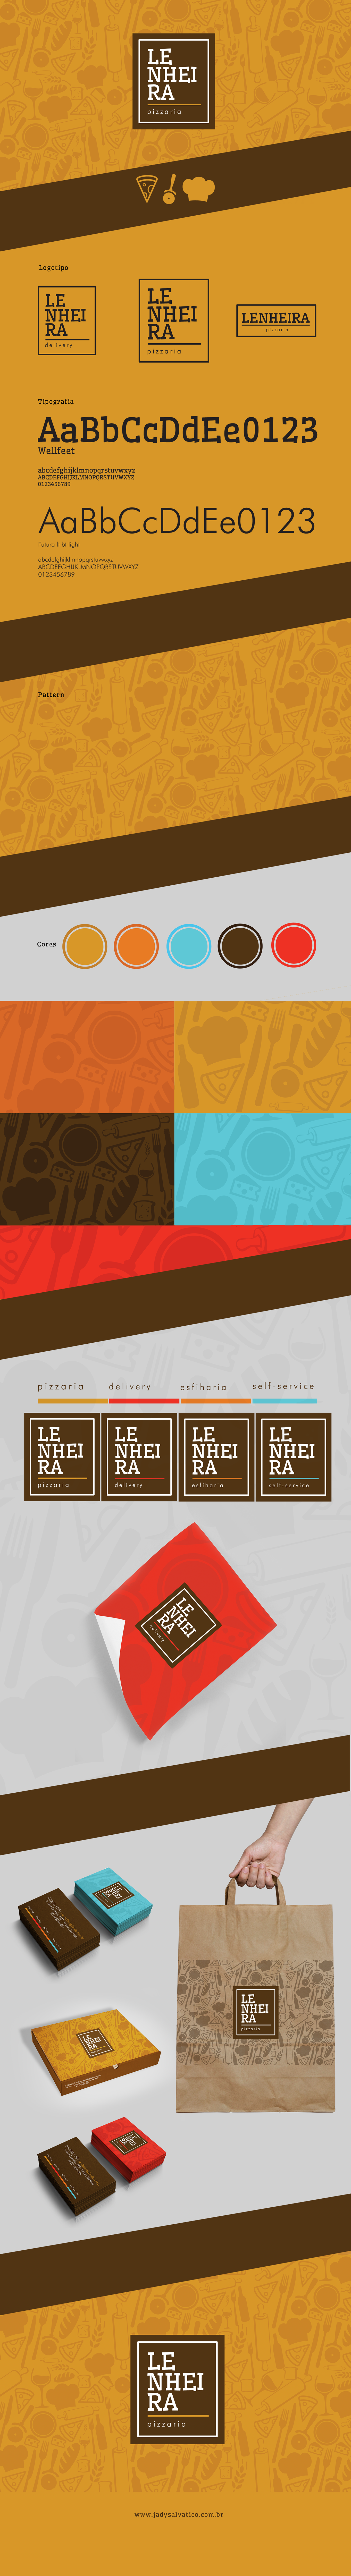 Pizza restaurant visual identity brand design Food  pattern